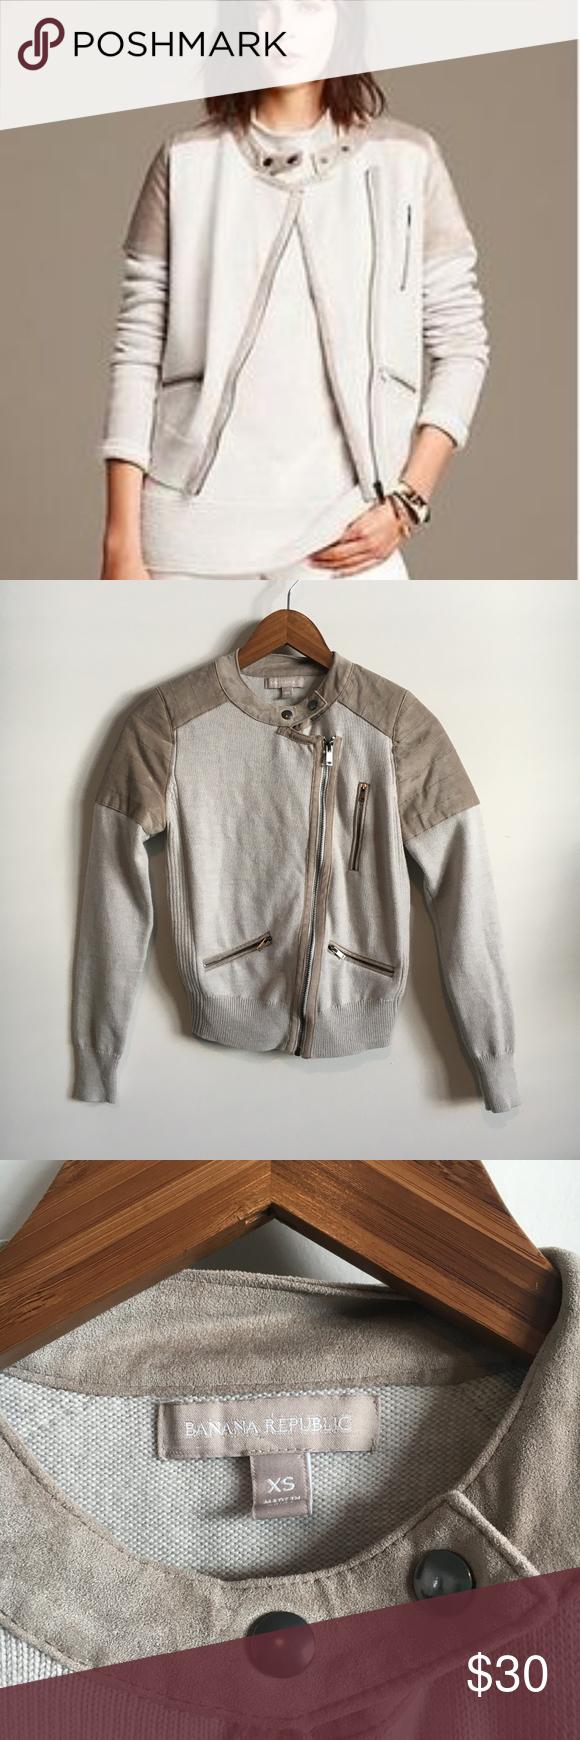 Banana Republic Sweater Moto Jacket Faux Suede Banana